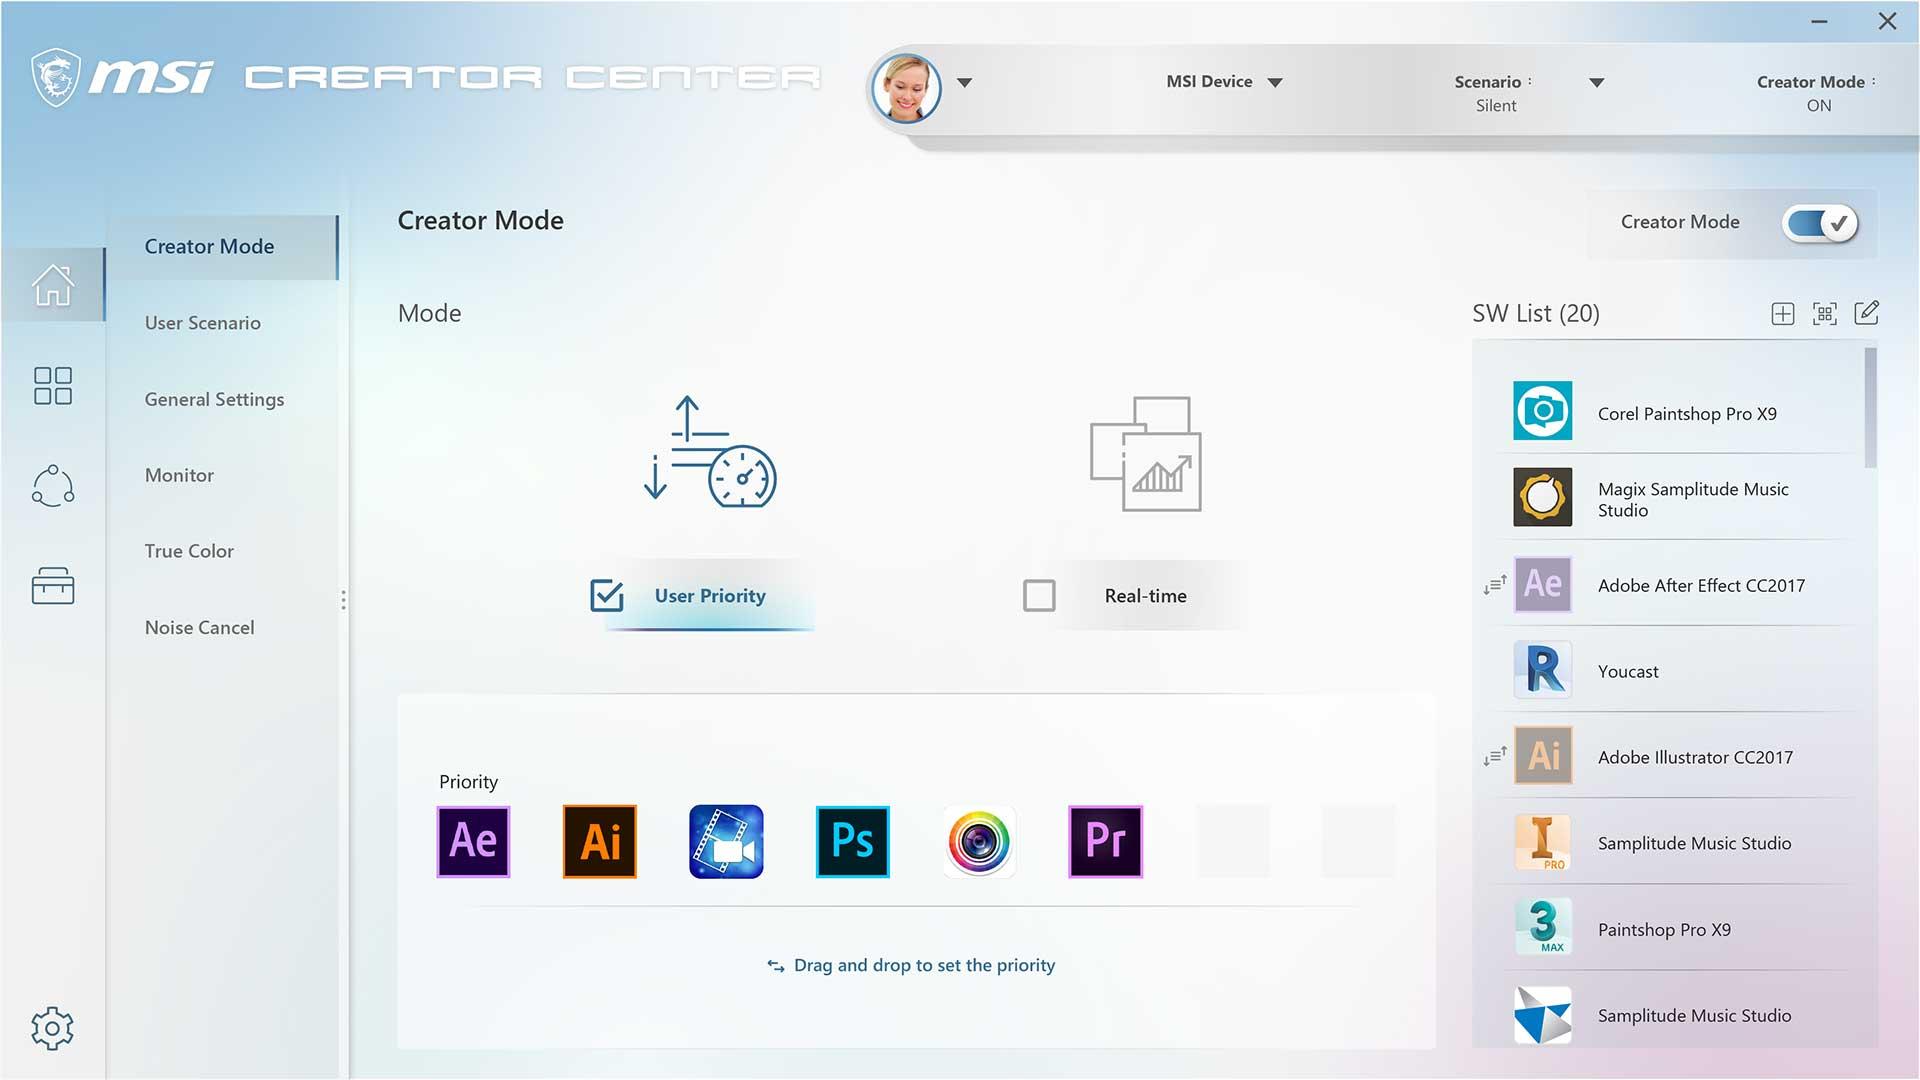 creator_mode